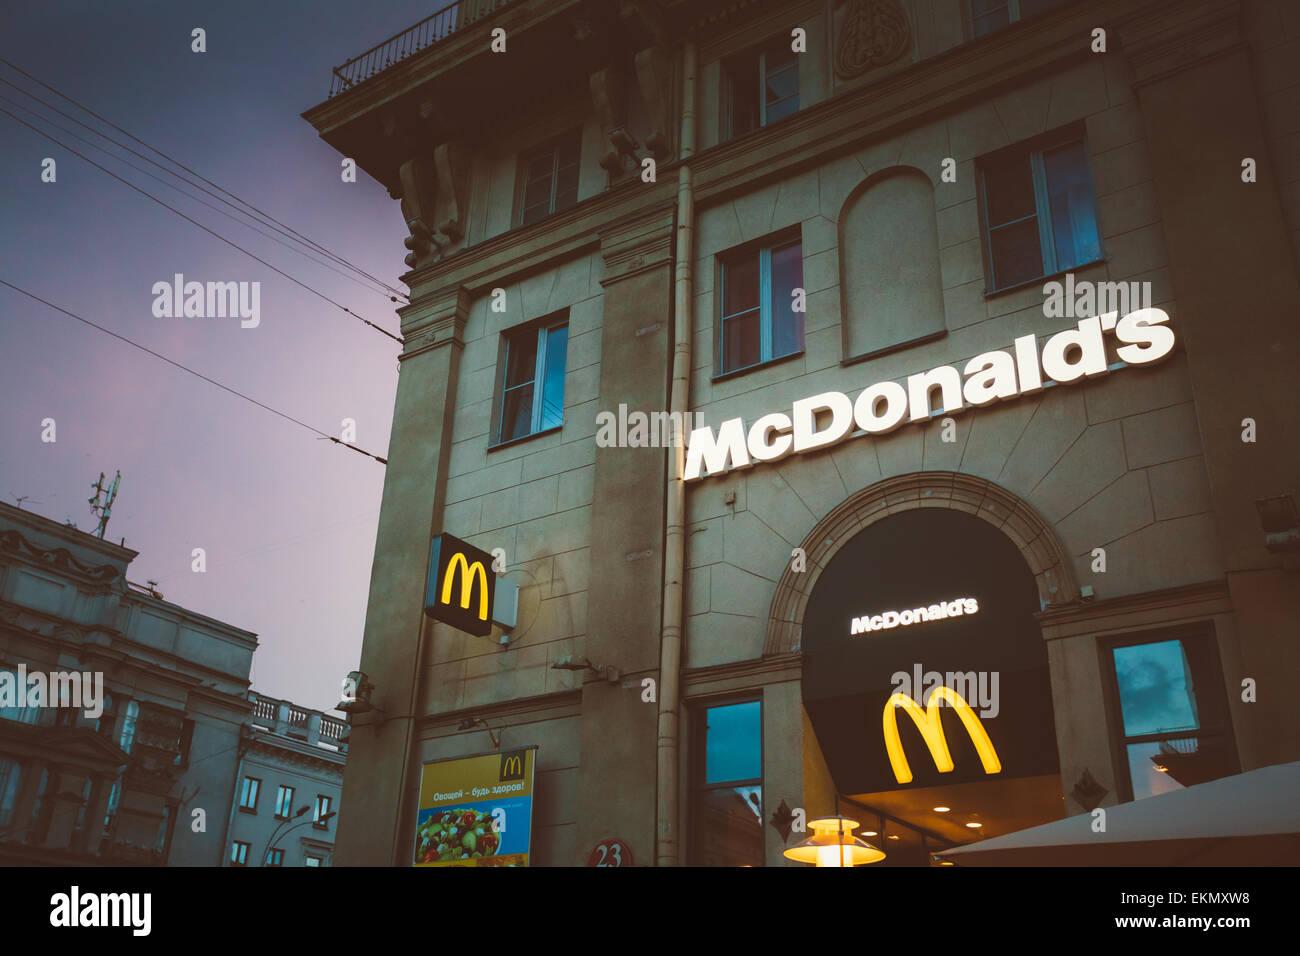 Mcdonalds Restaurant Mcdonald\'s Mcdonald Stockfotos & Mcdonalds ...